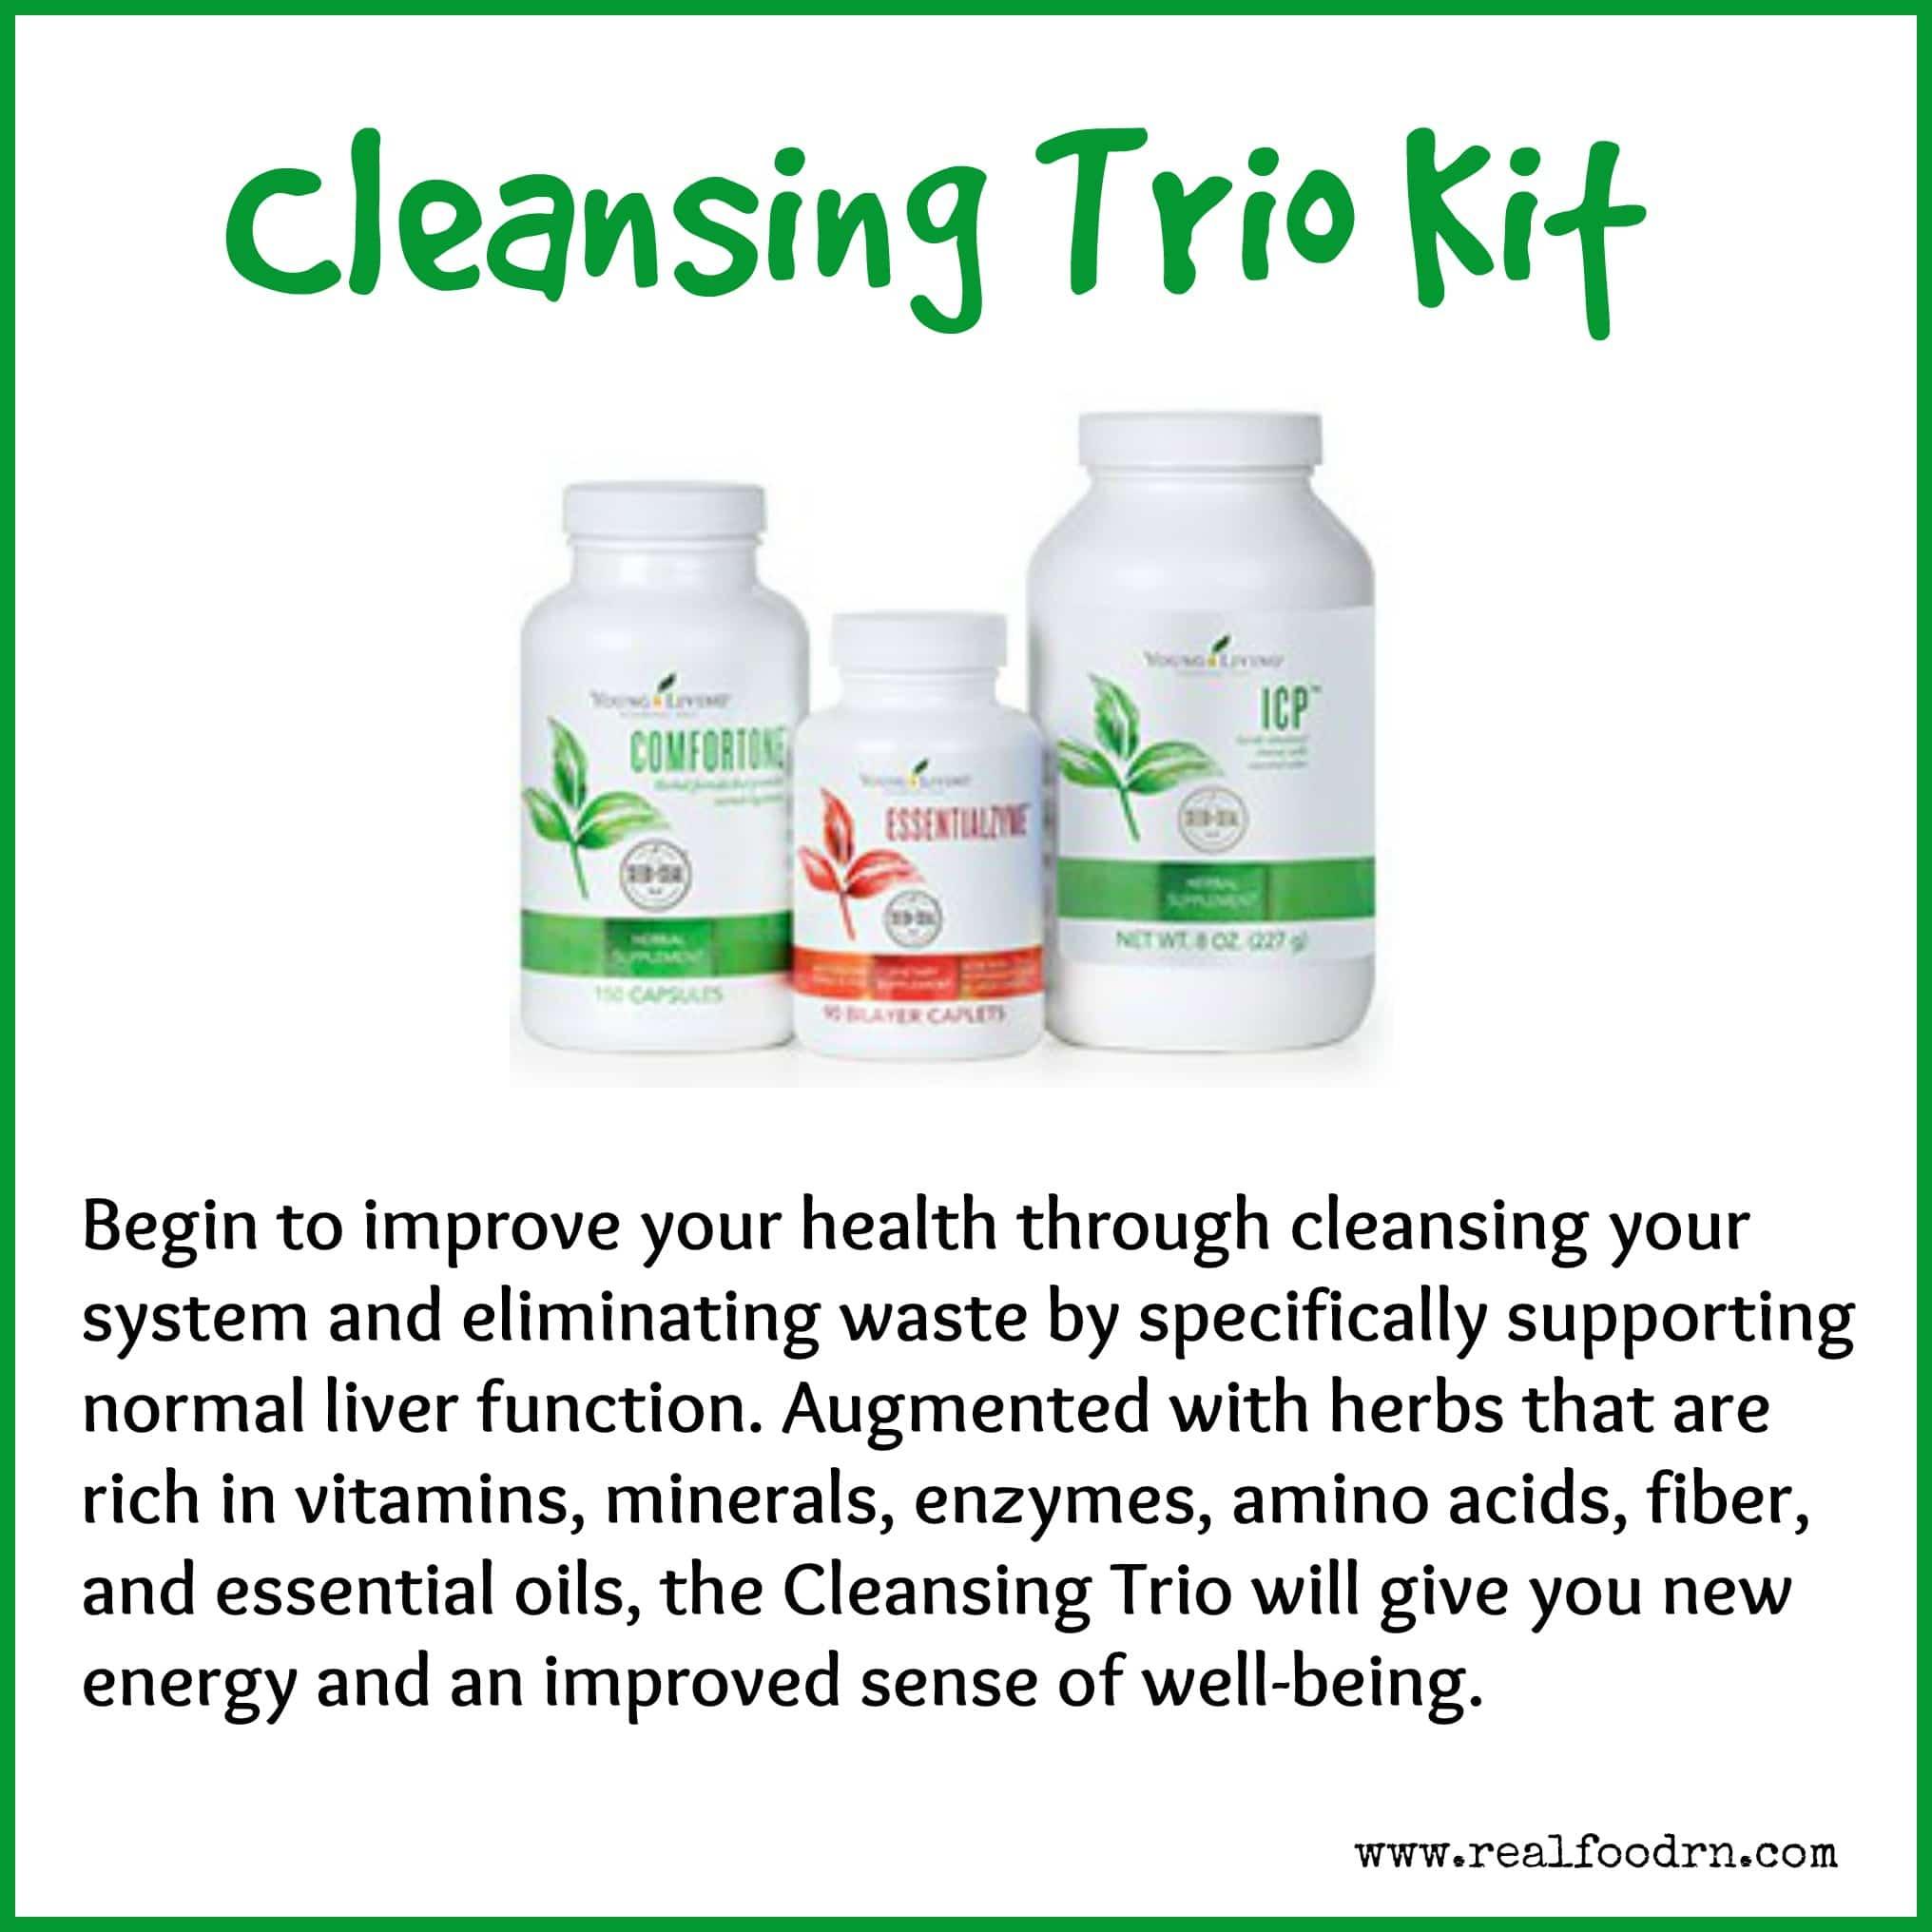 Cleansing Trio Kit